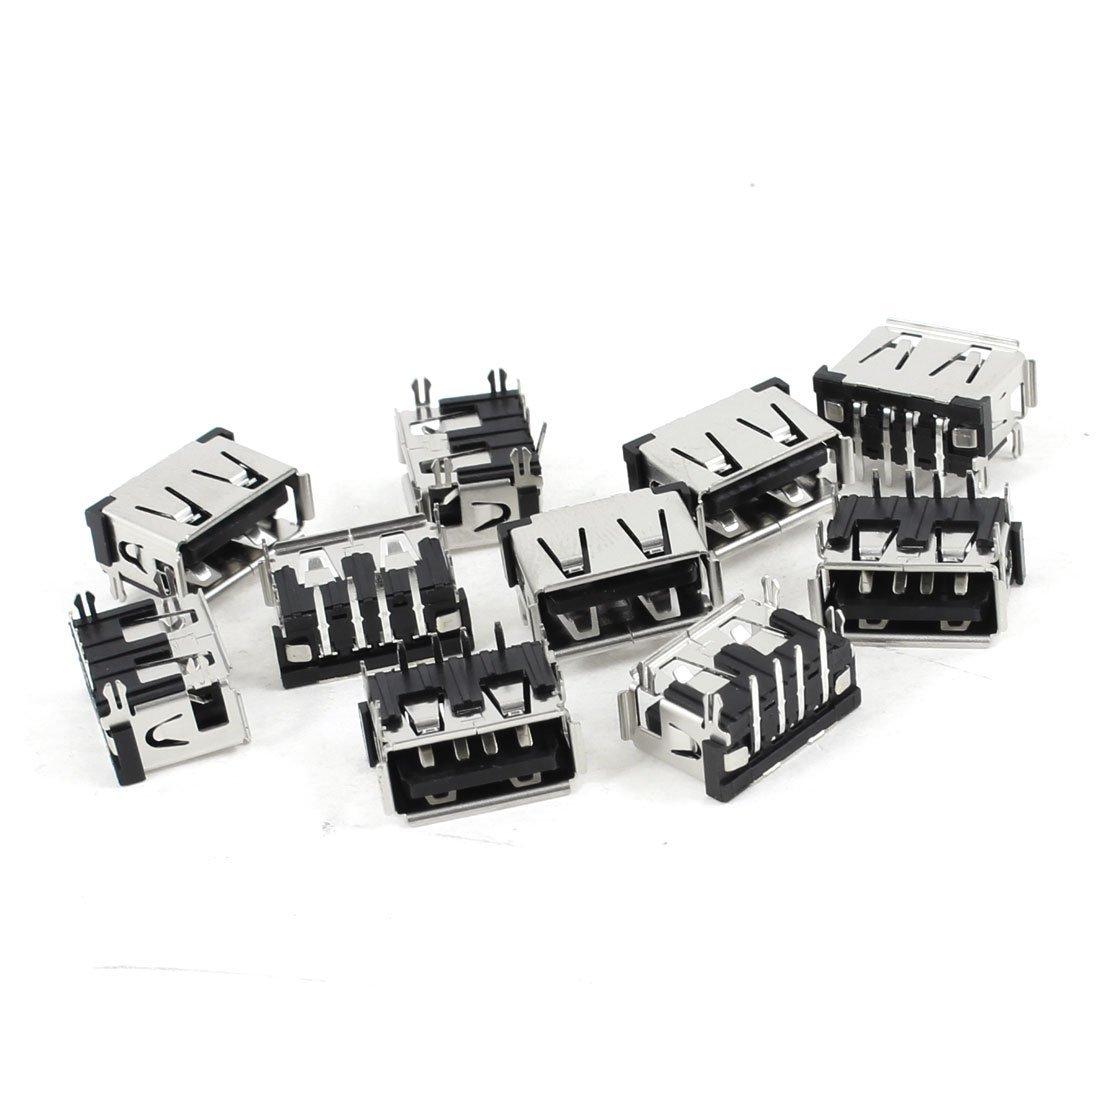 uxcell 10 Pcs Shielded USB 2.0 Type A 90 Degree 4-Pin Female Jack Socket